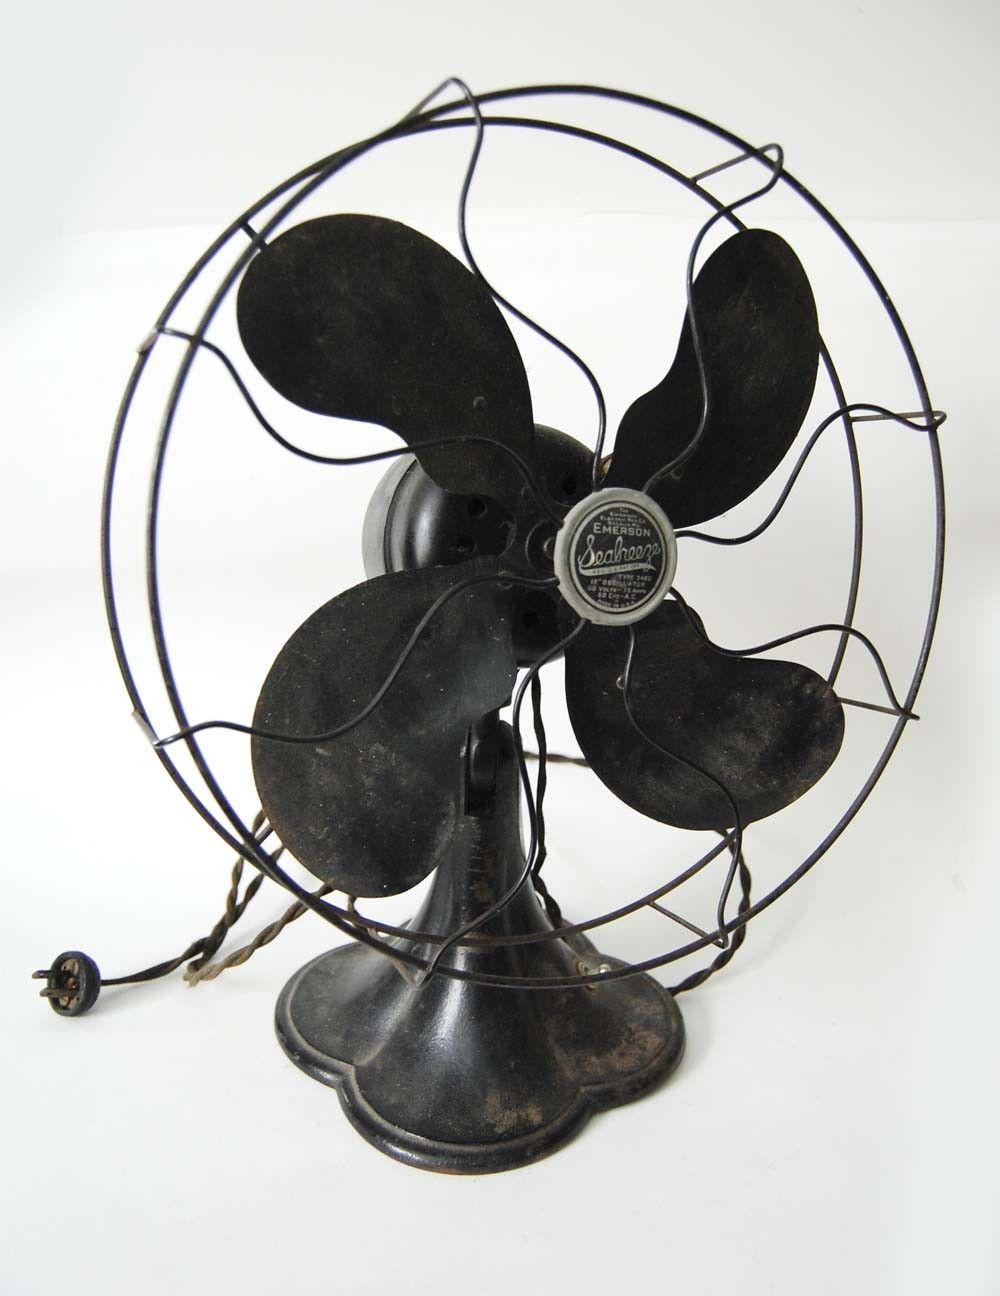 Vintage Emerson Seabreeze Fan Vintage Fans Fan Antique Fans